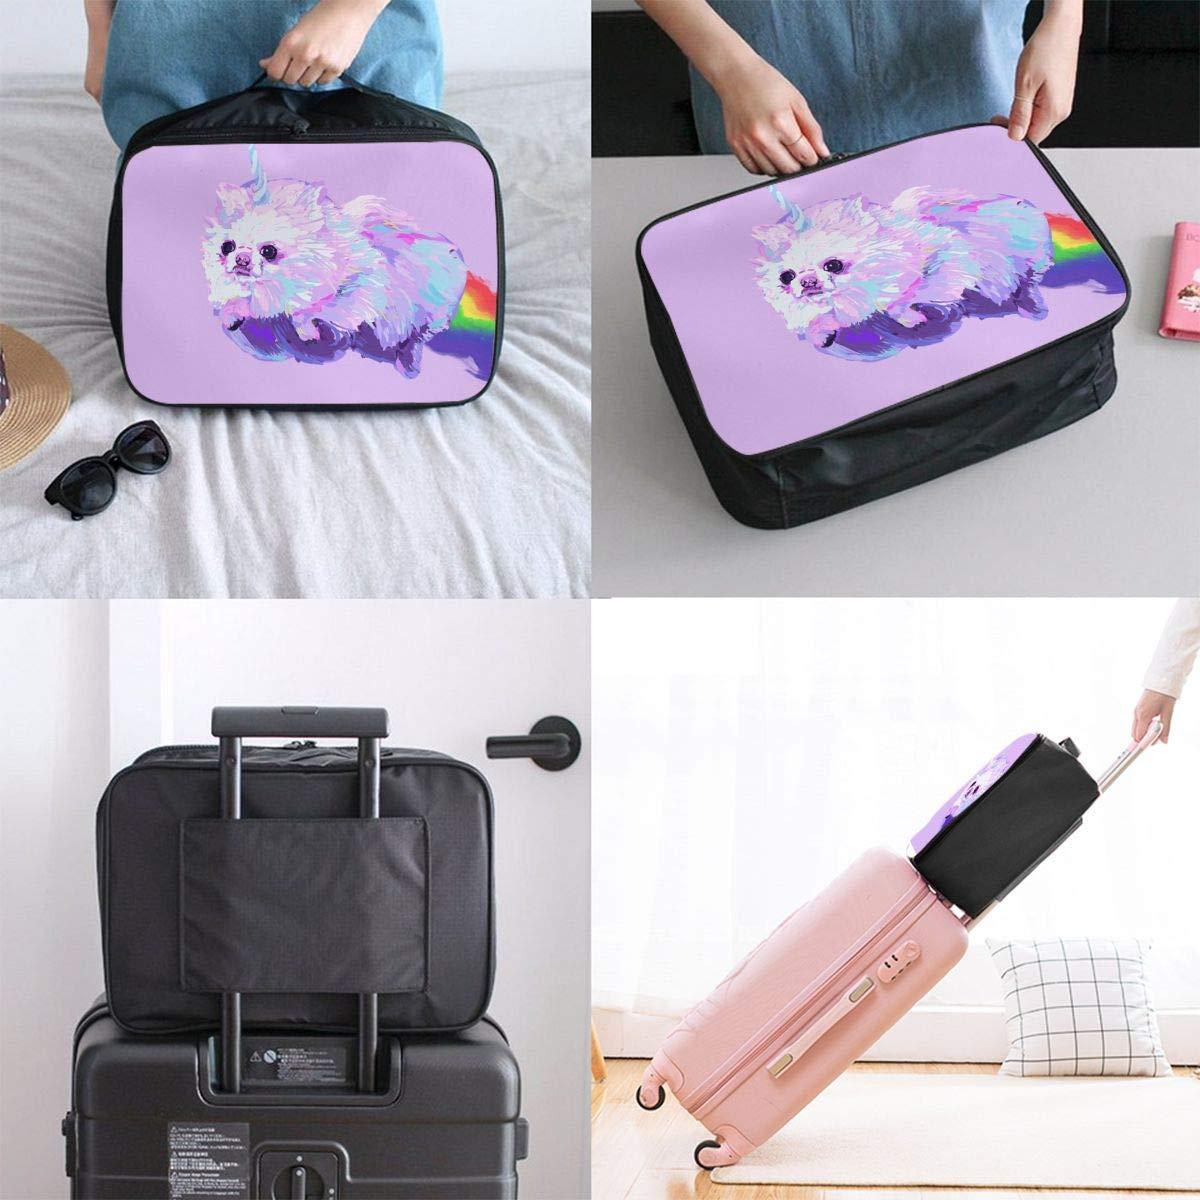 Lightweight Large Capacity Portable Duffel Bag for Men /& Women Rainbow Pomeranian Dog Travel Duffel Bag Backpack JTRVW Luggage Bags for Travel